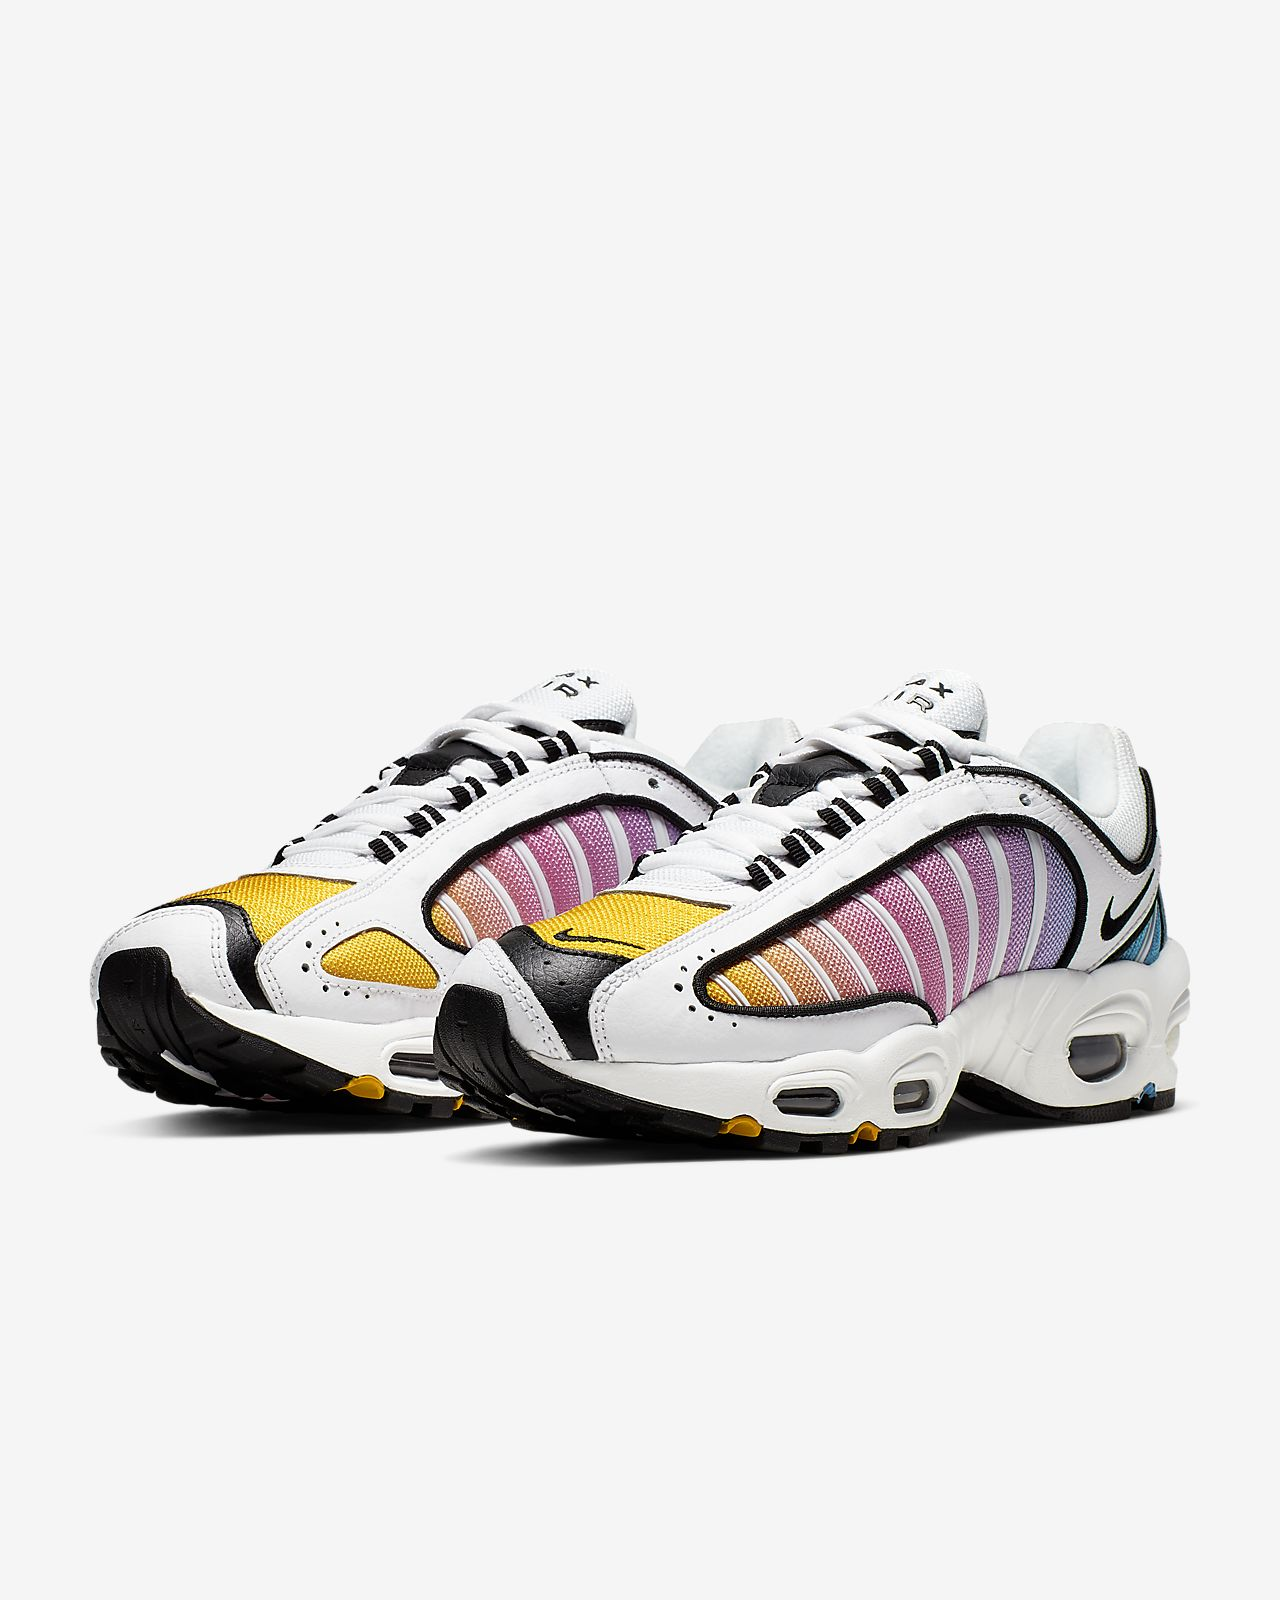 Nike Air Max Tailwind IV sko til dame